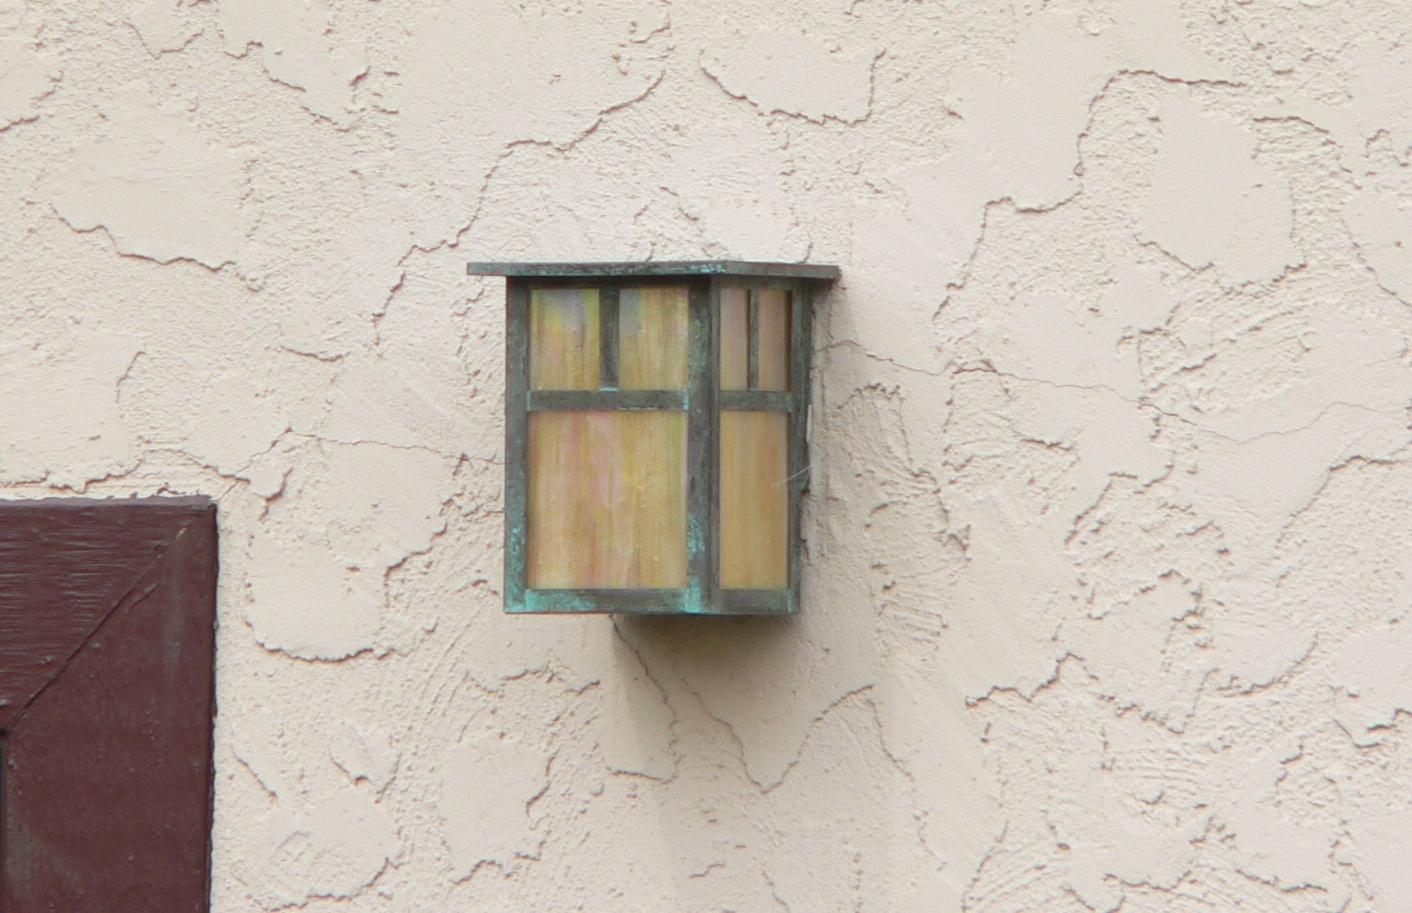 913 #7D684E File:Harvey Sutton House SSE Door Lamp.JPG Wikimedia Commons save image Harvey Doors 43271412